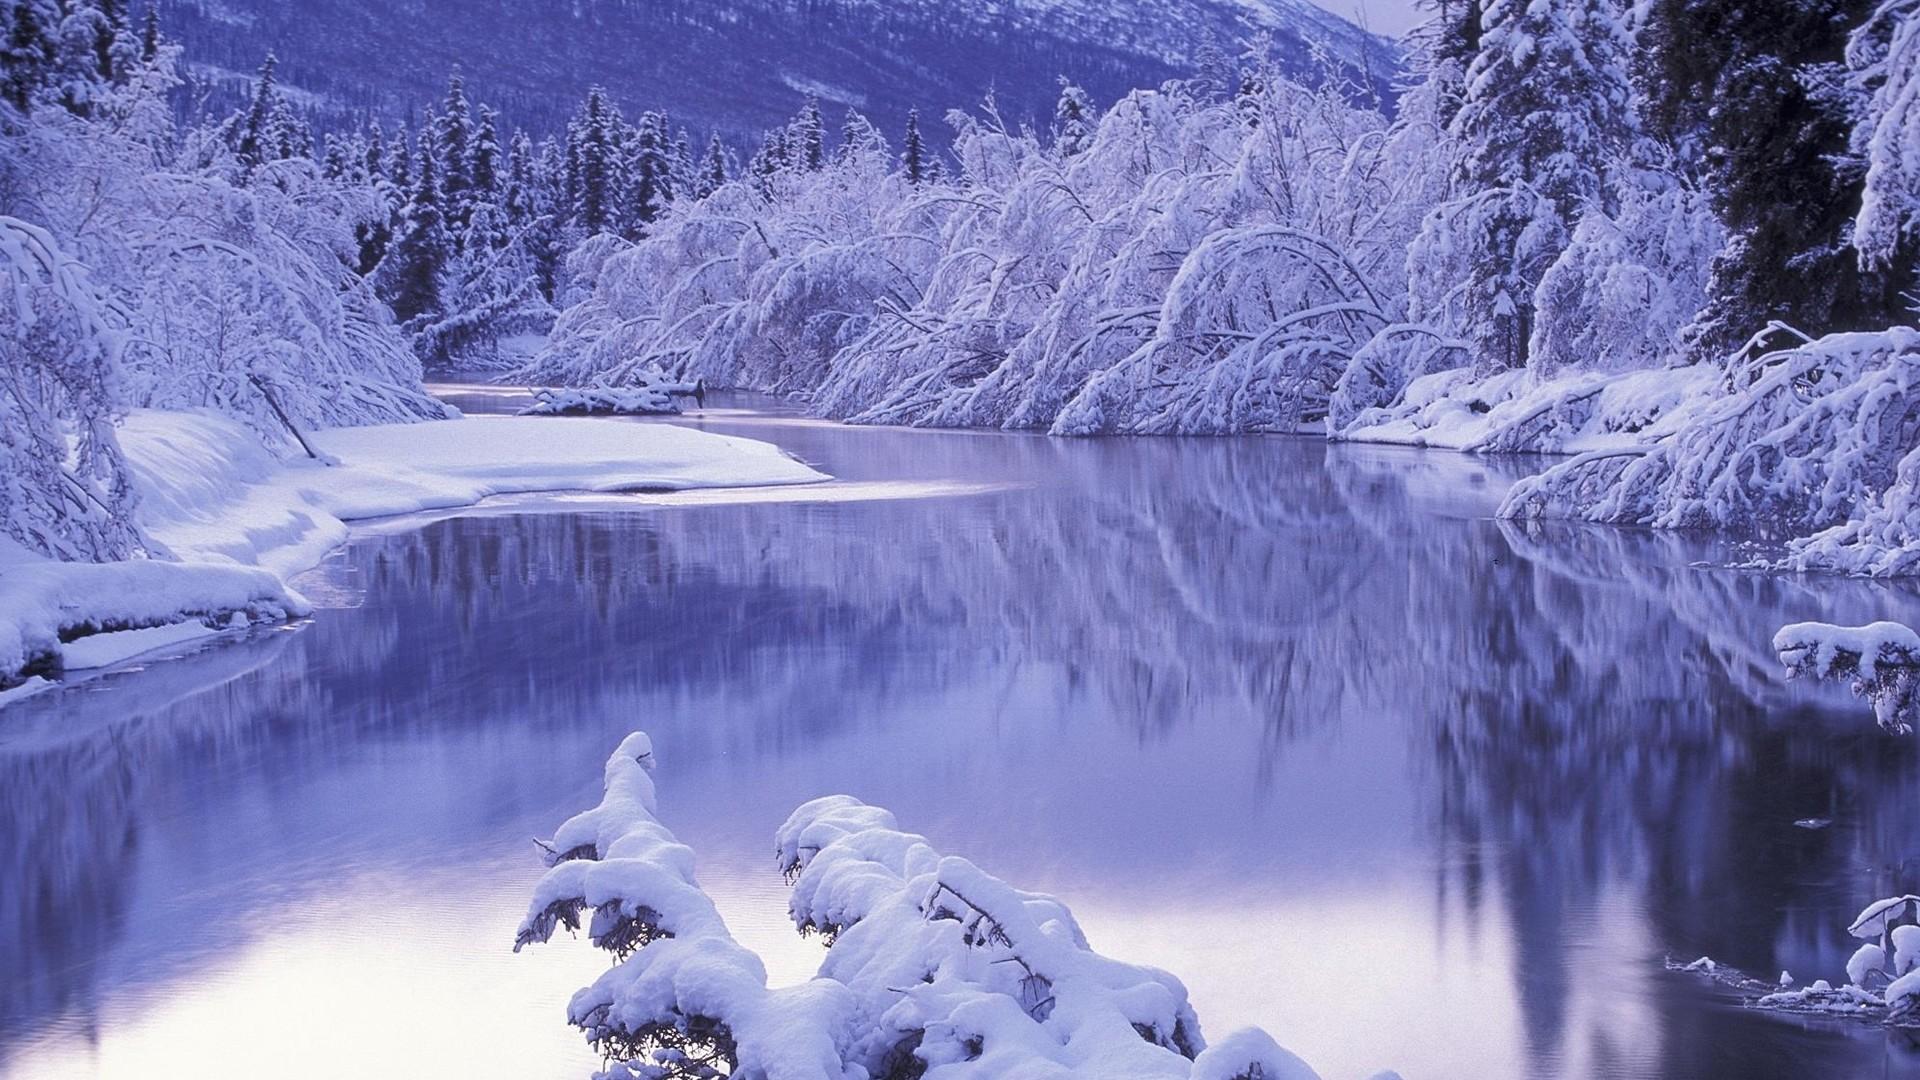 Preview wallpaper snow, white, winter, nature, scenery 1920×1080